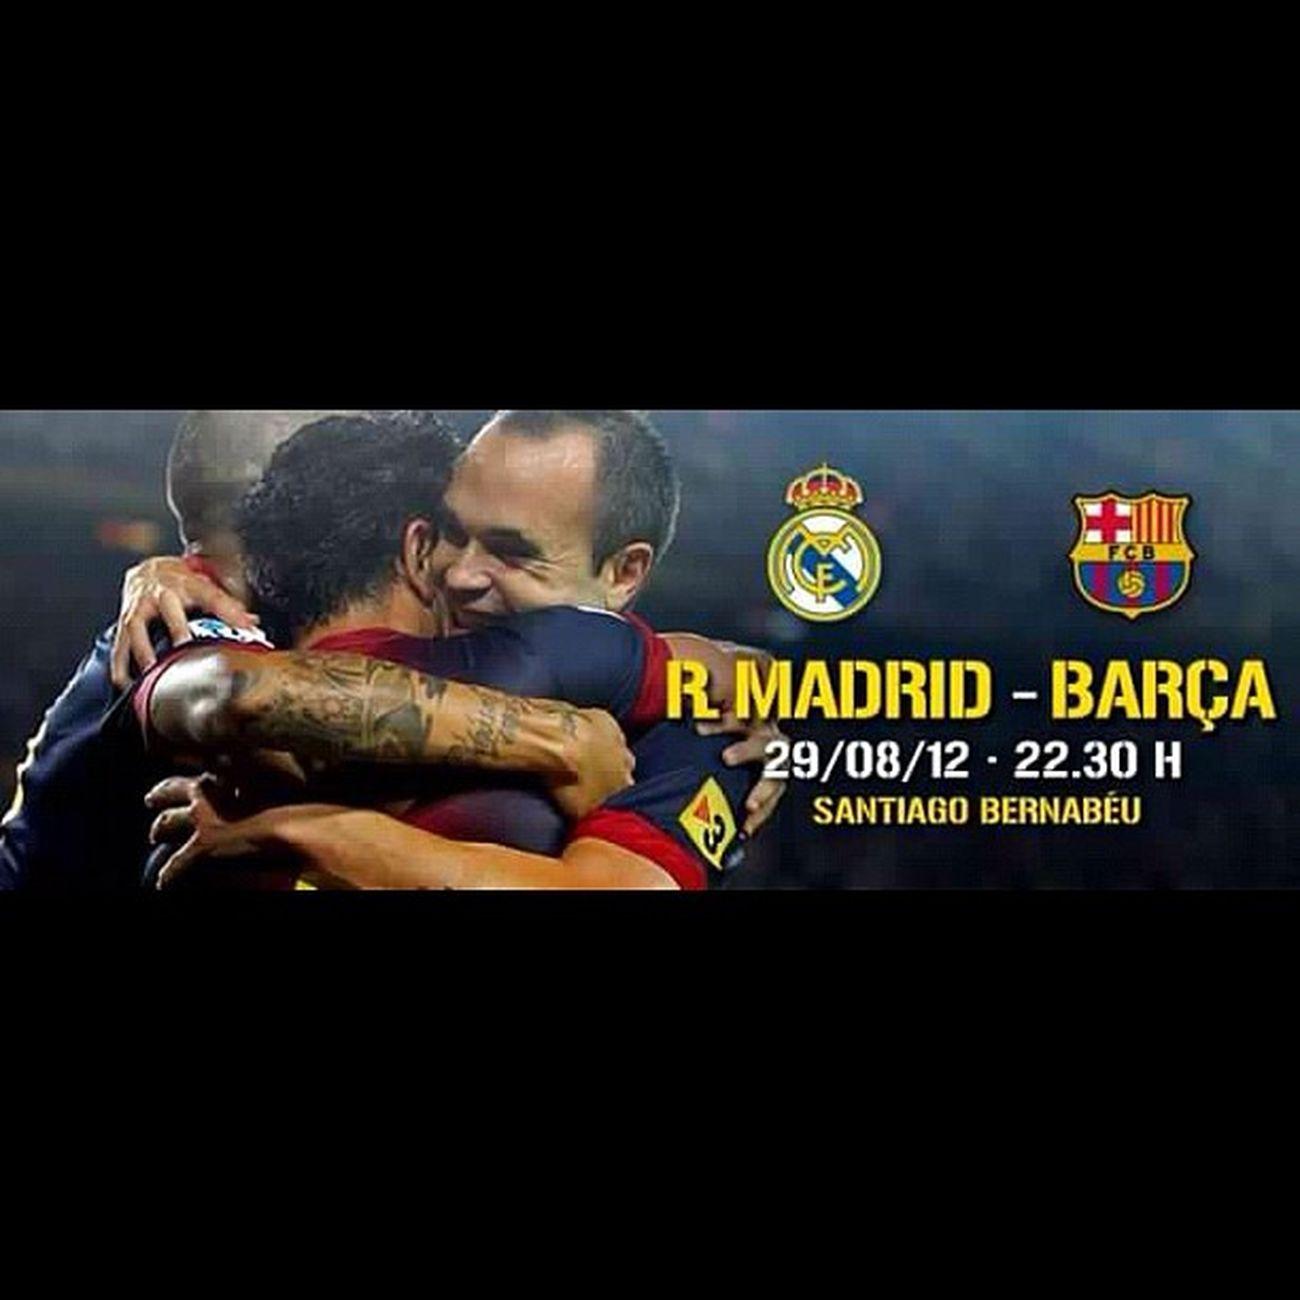 Força Barça !! Vamos ! Spanish Supercup supercopa españa fcb realmadrid laliga